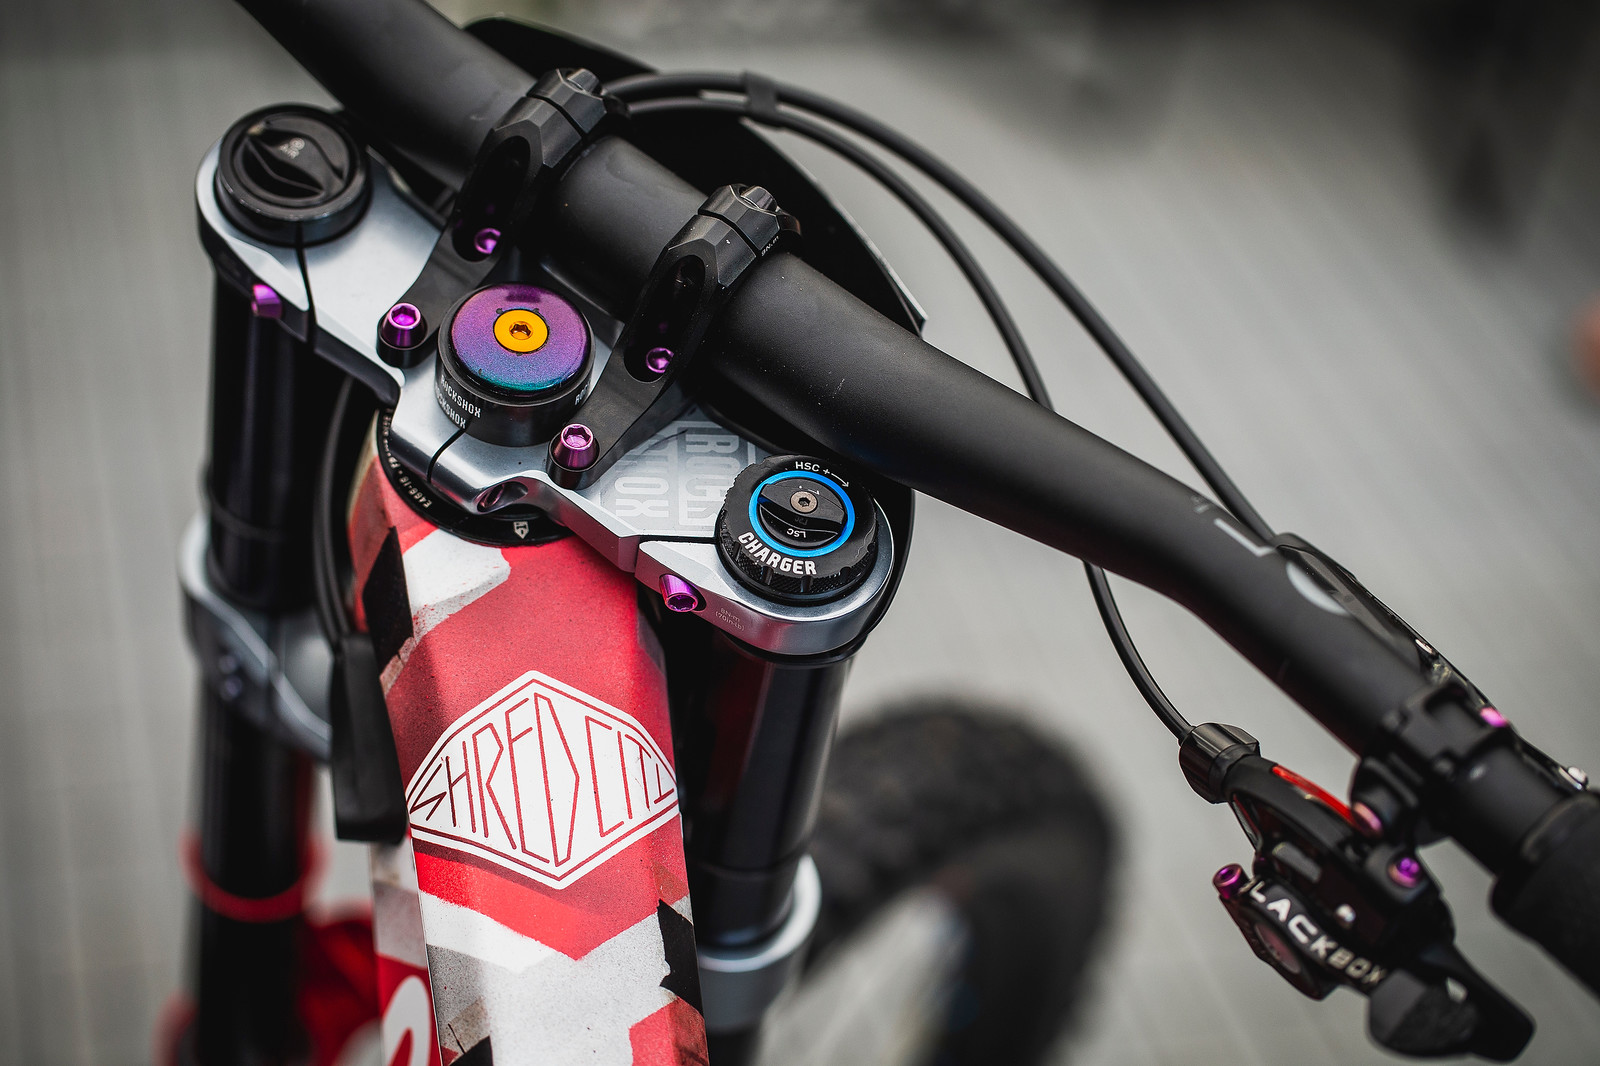 Ti Bolt Oil-Slick Goodness everywhere - PIT BITS - 2019 Val di Sole World Cup Downhill Bike Tech - Mountain Biking Pictures - Vital MTB